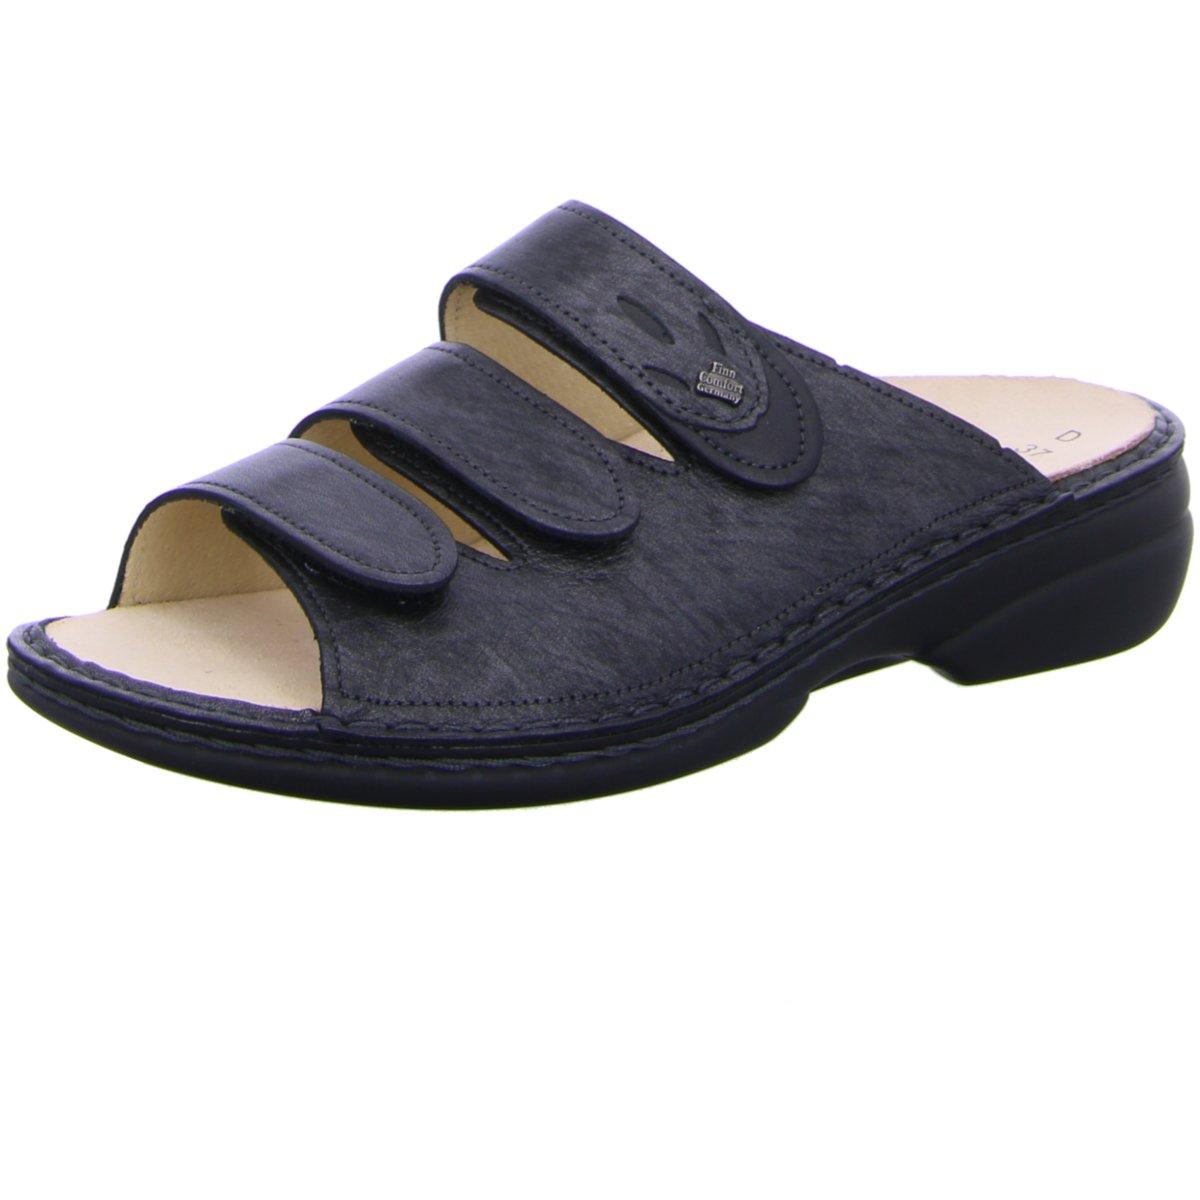 NEU FinnComfort Damen Pantoletten Kos 02554-901521 blackargento schwarz Luxory